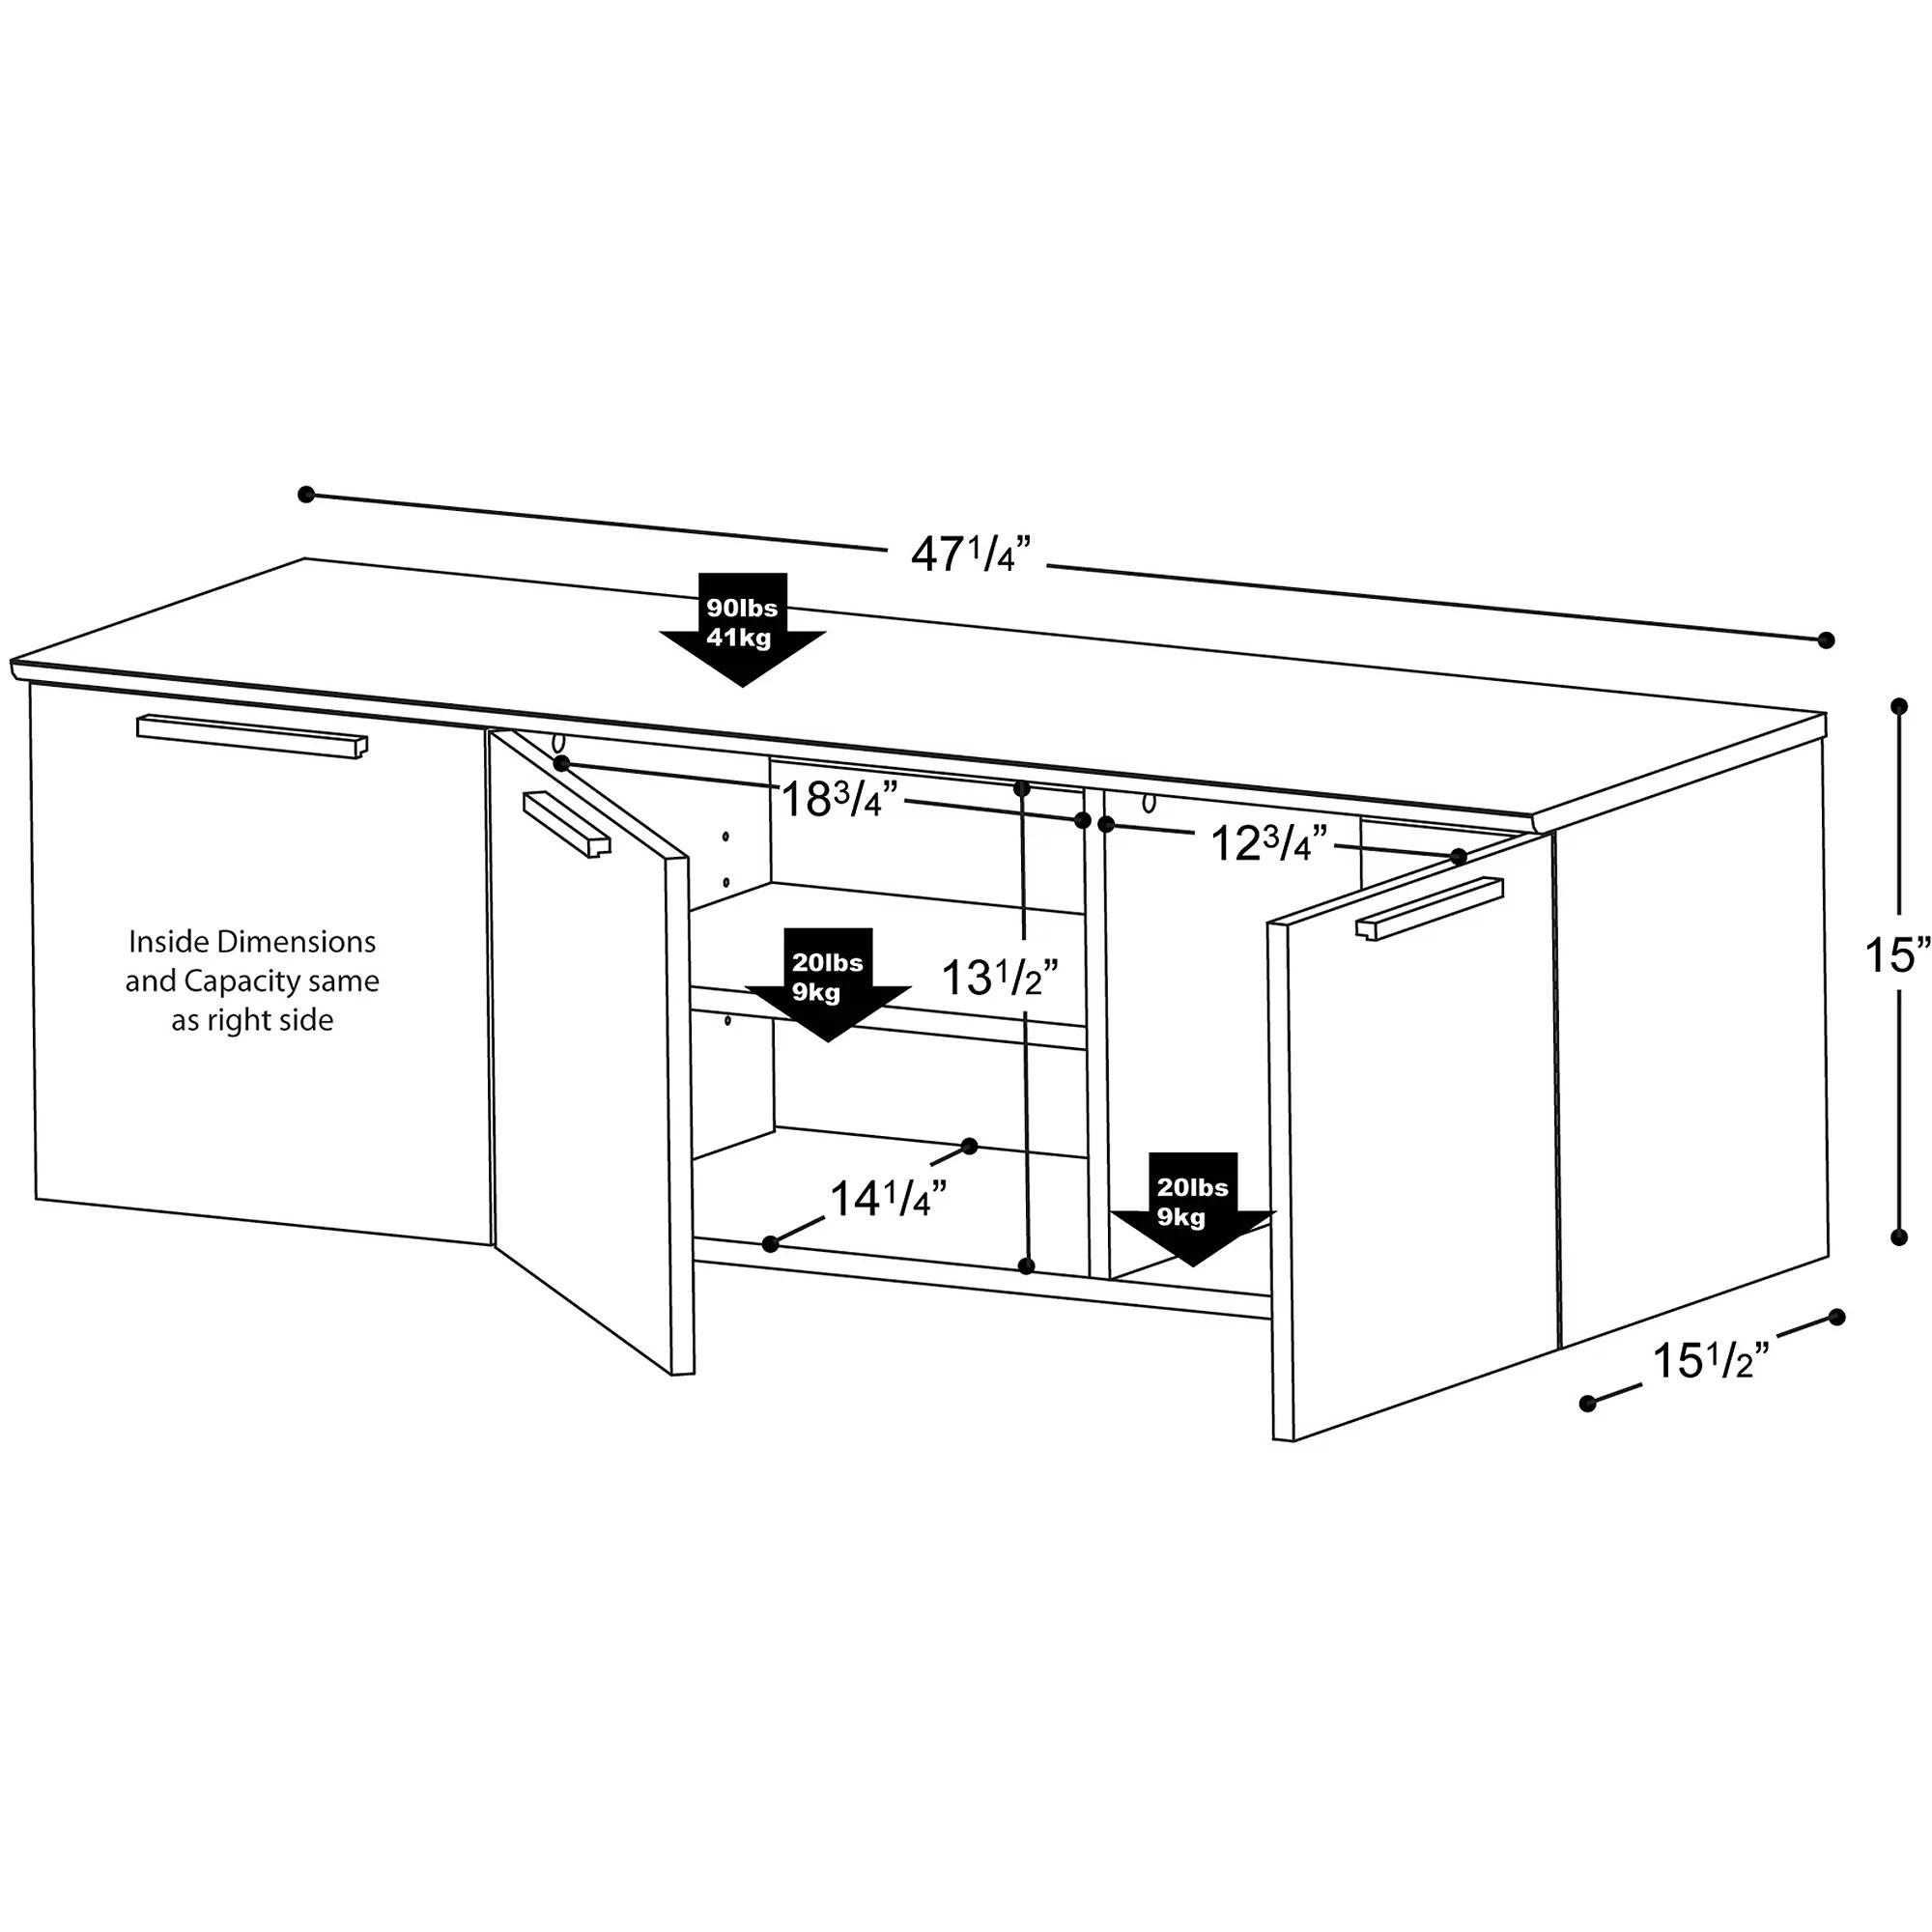 Wiring Diagram 1486 International Tractor, Wiring, Get